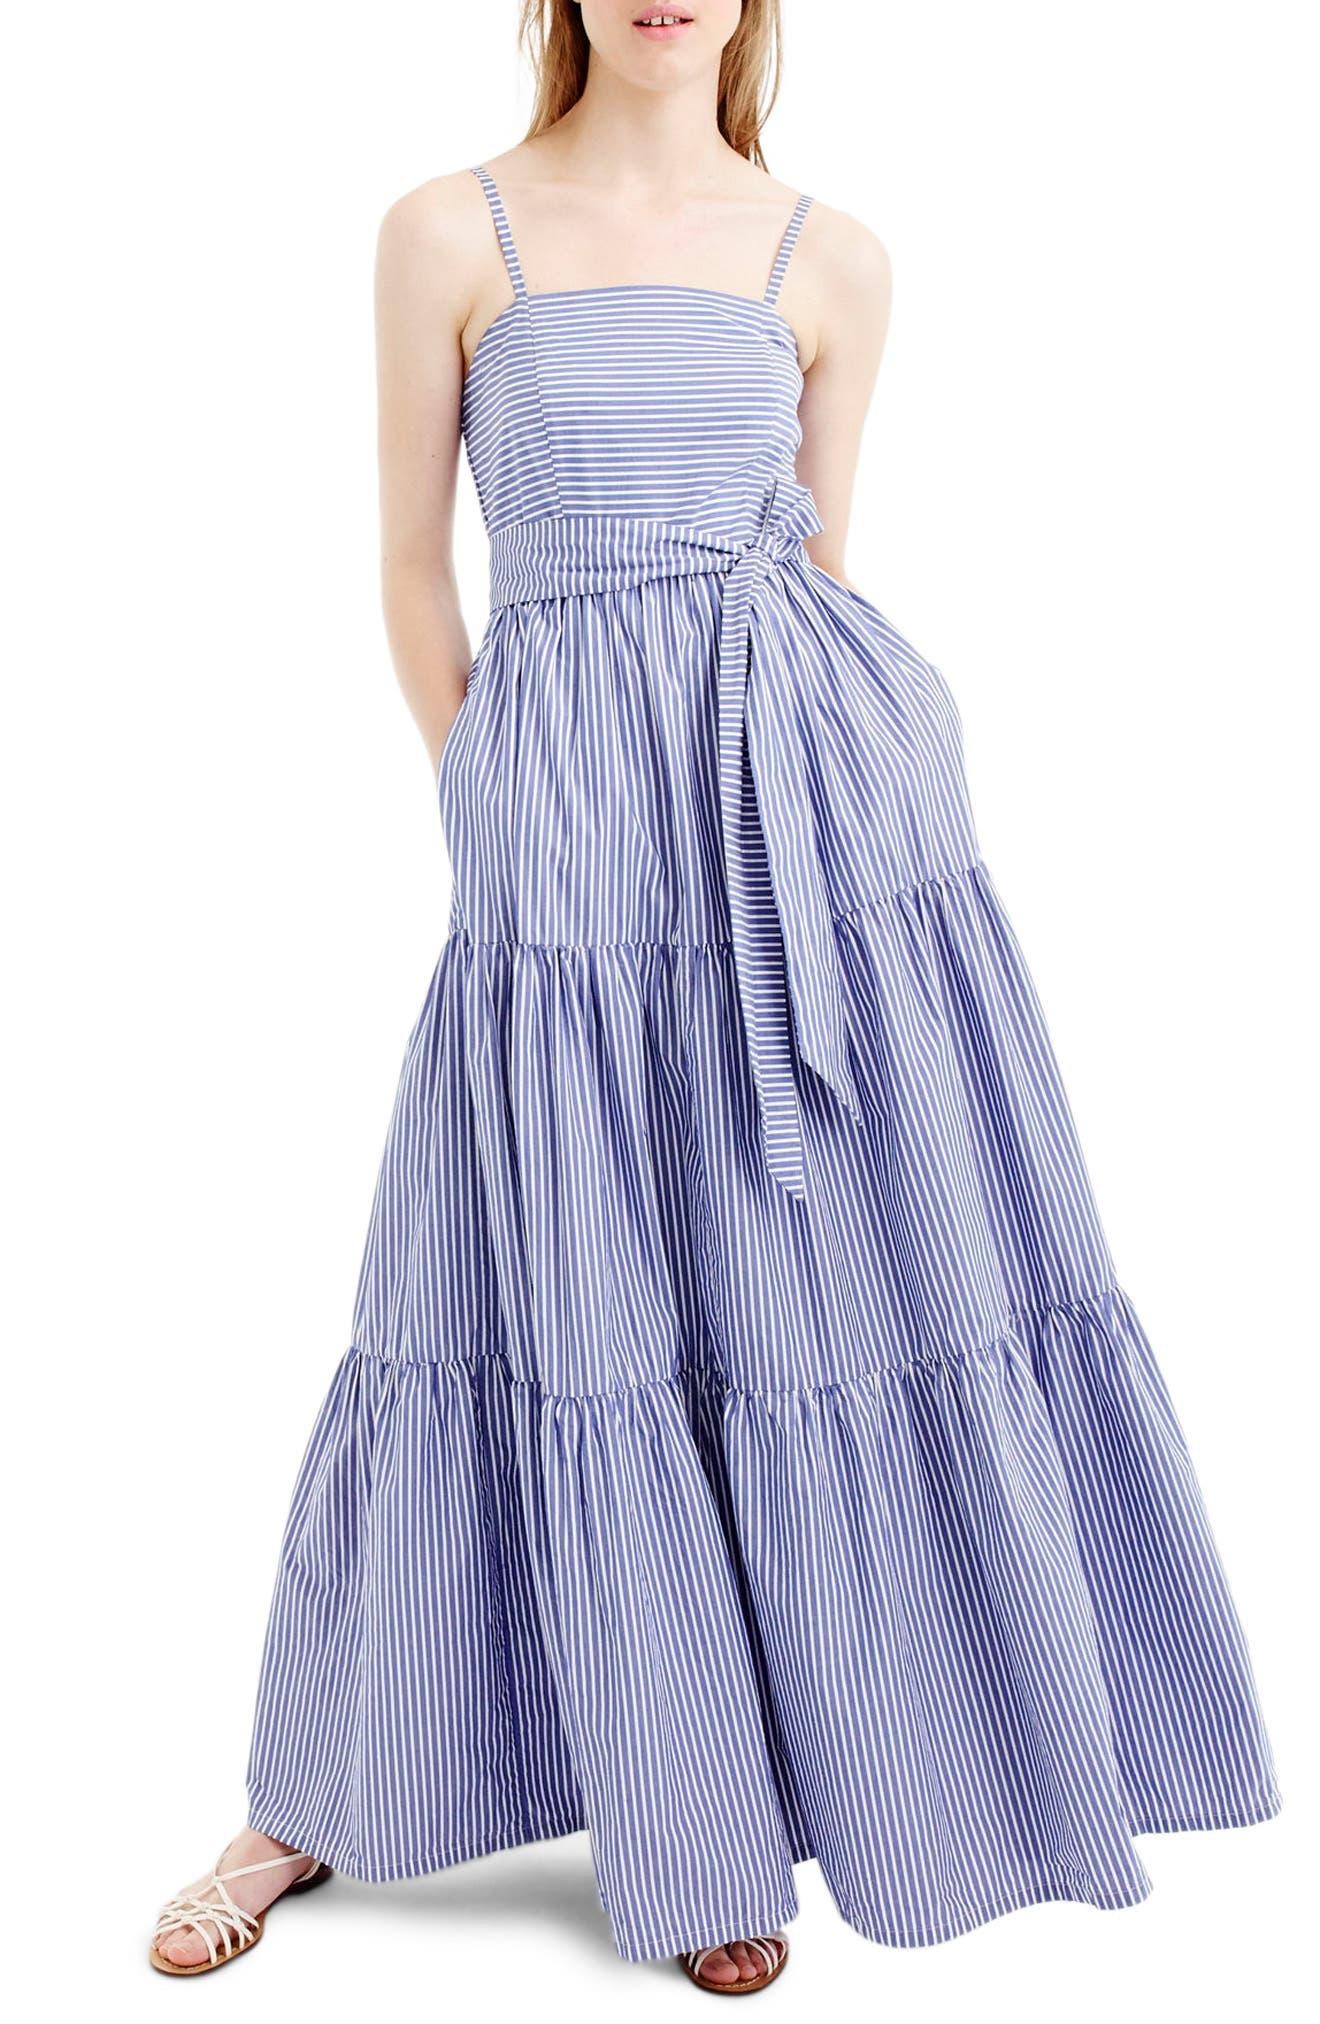 Main Image - J.Crew Stripe Tiered Maxi Dress (Regular & Petite)